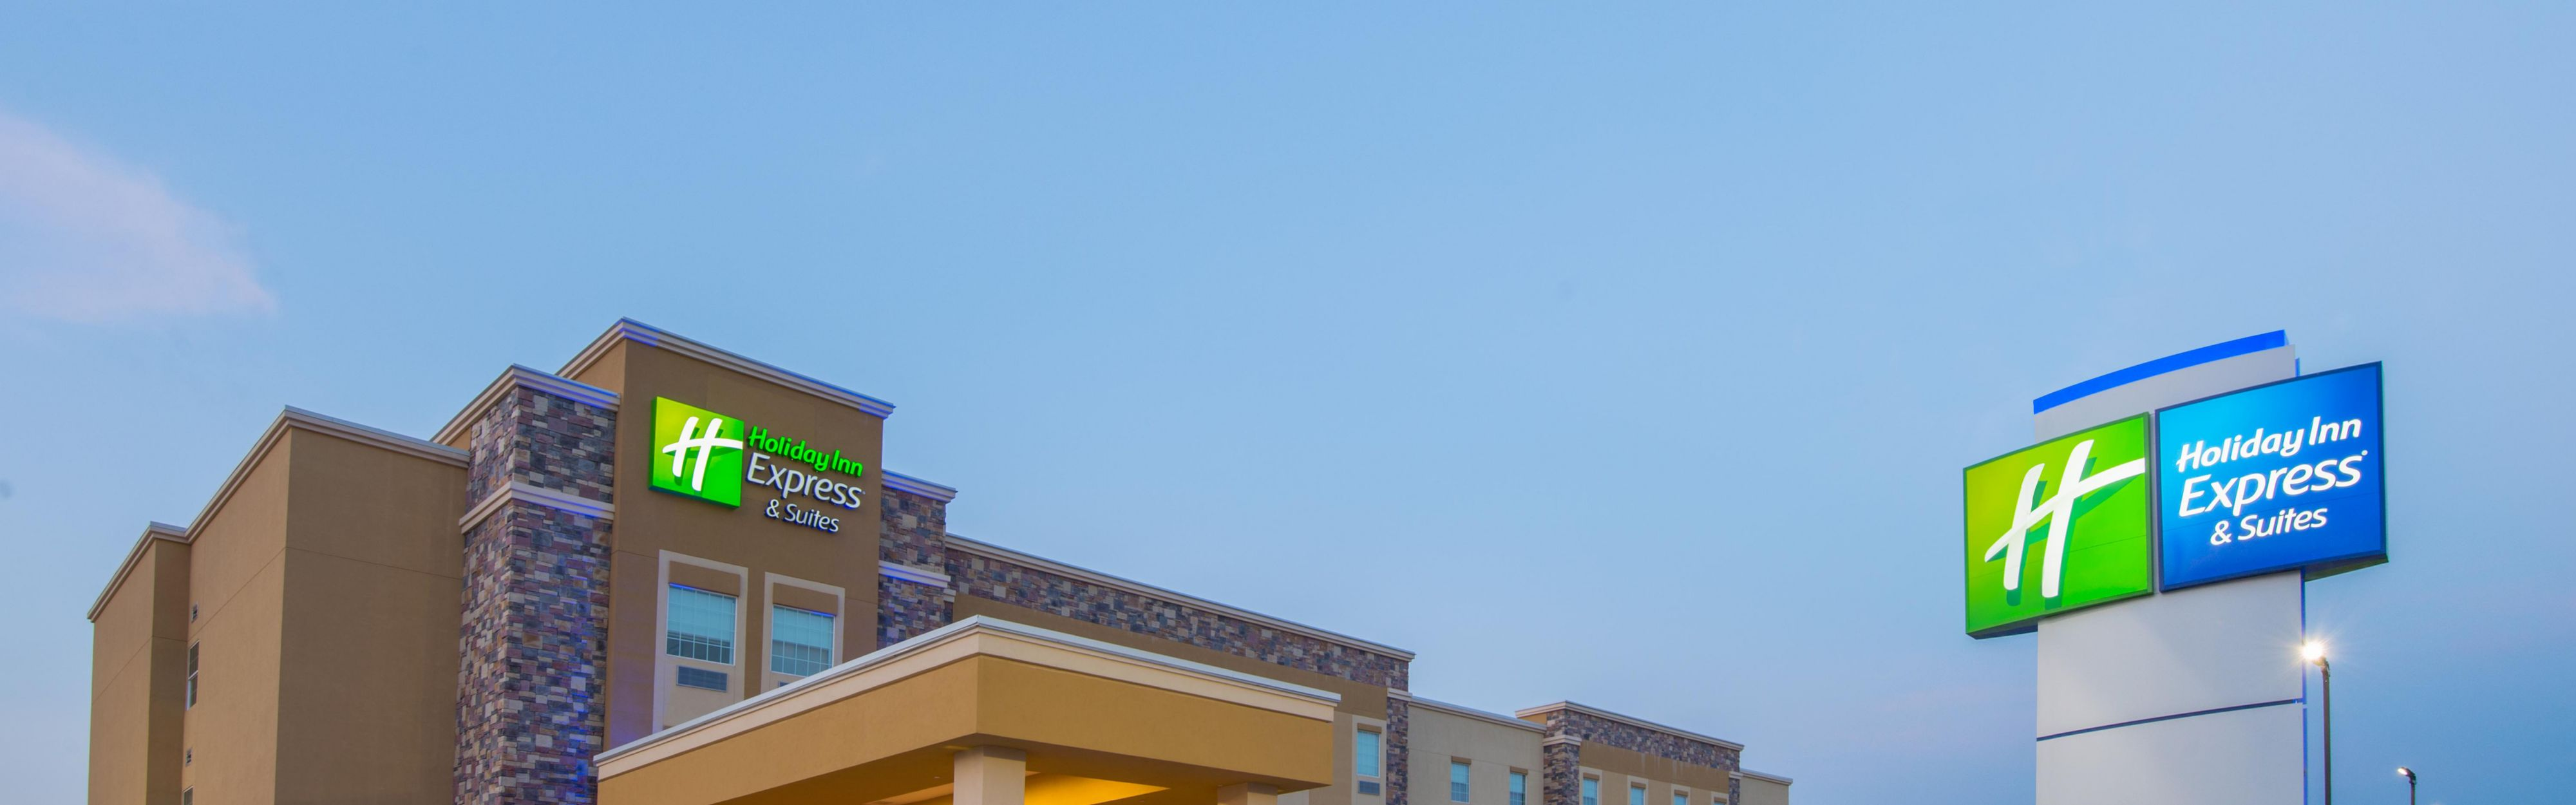 Holiday Inn Express & Suites Stillwater - University Area image 0